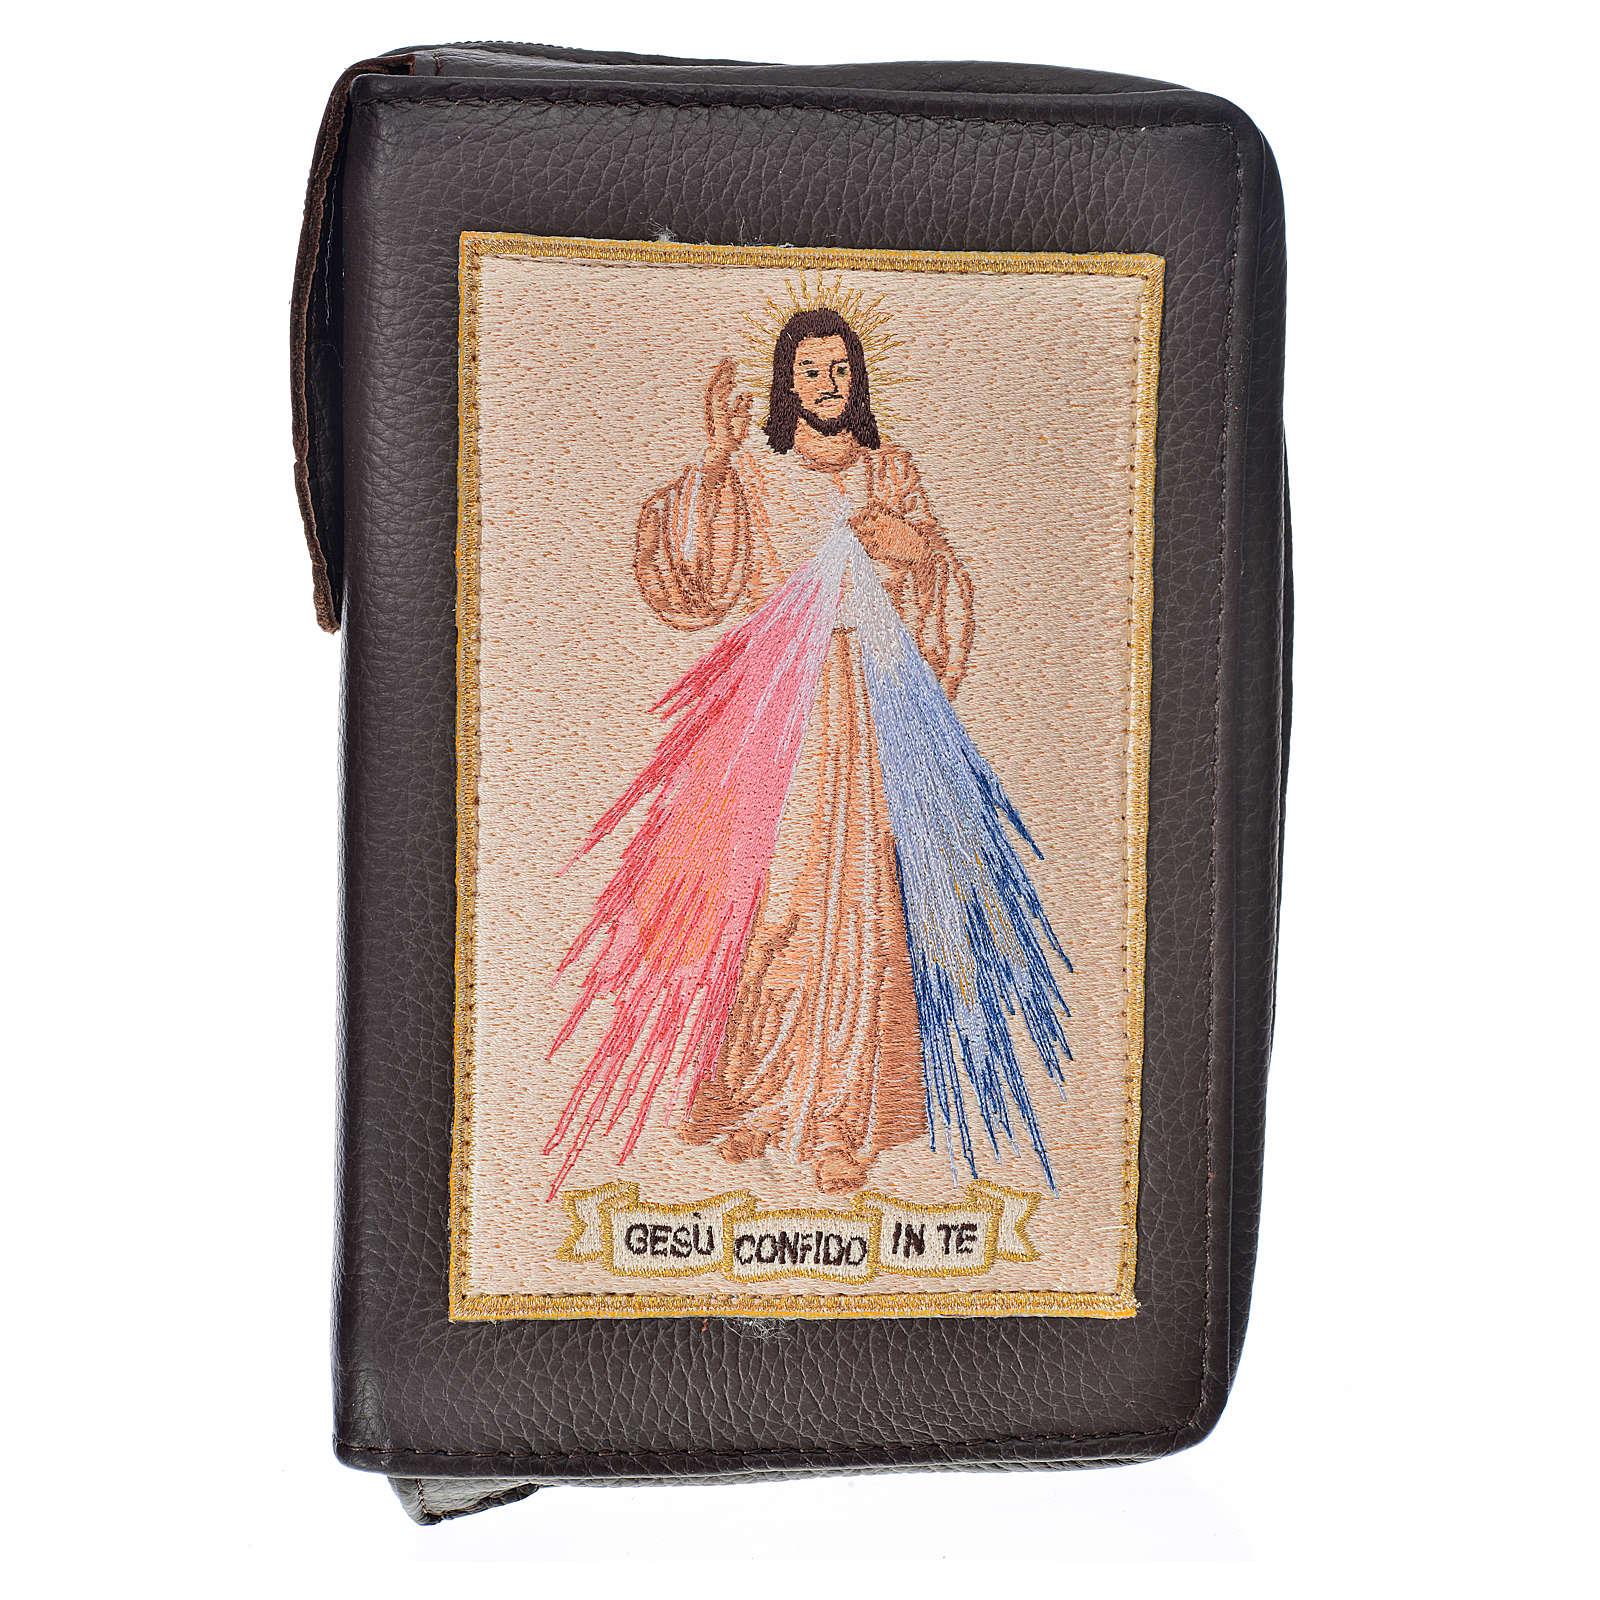 Funda Sagrada Biblia CEE ED. Pop. marrón oscuro simil cuero D. M 4